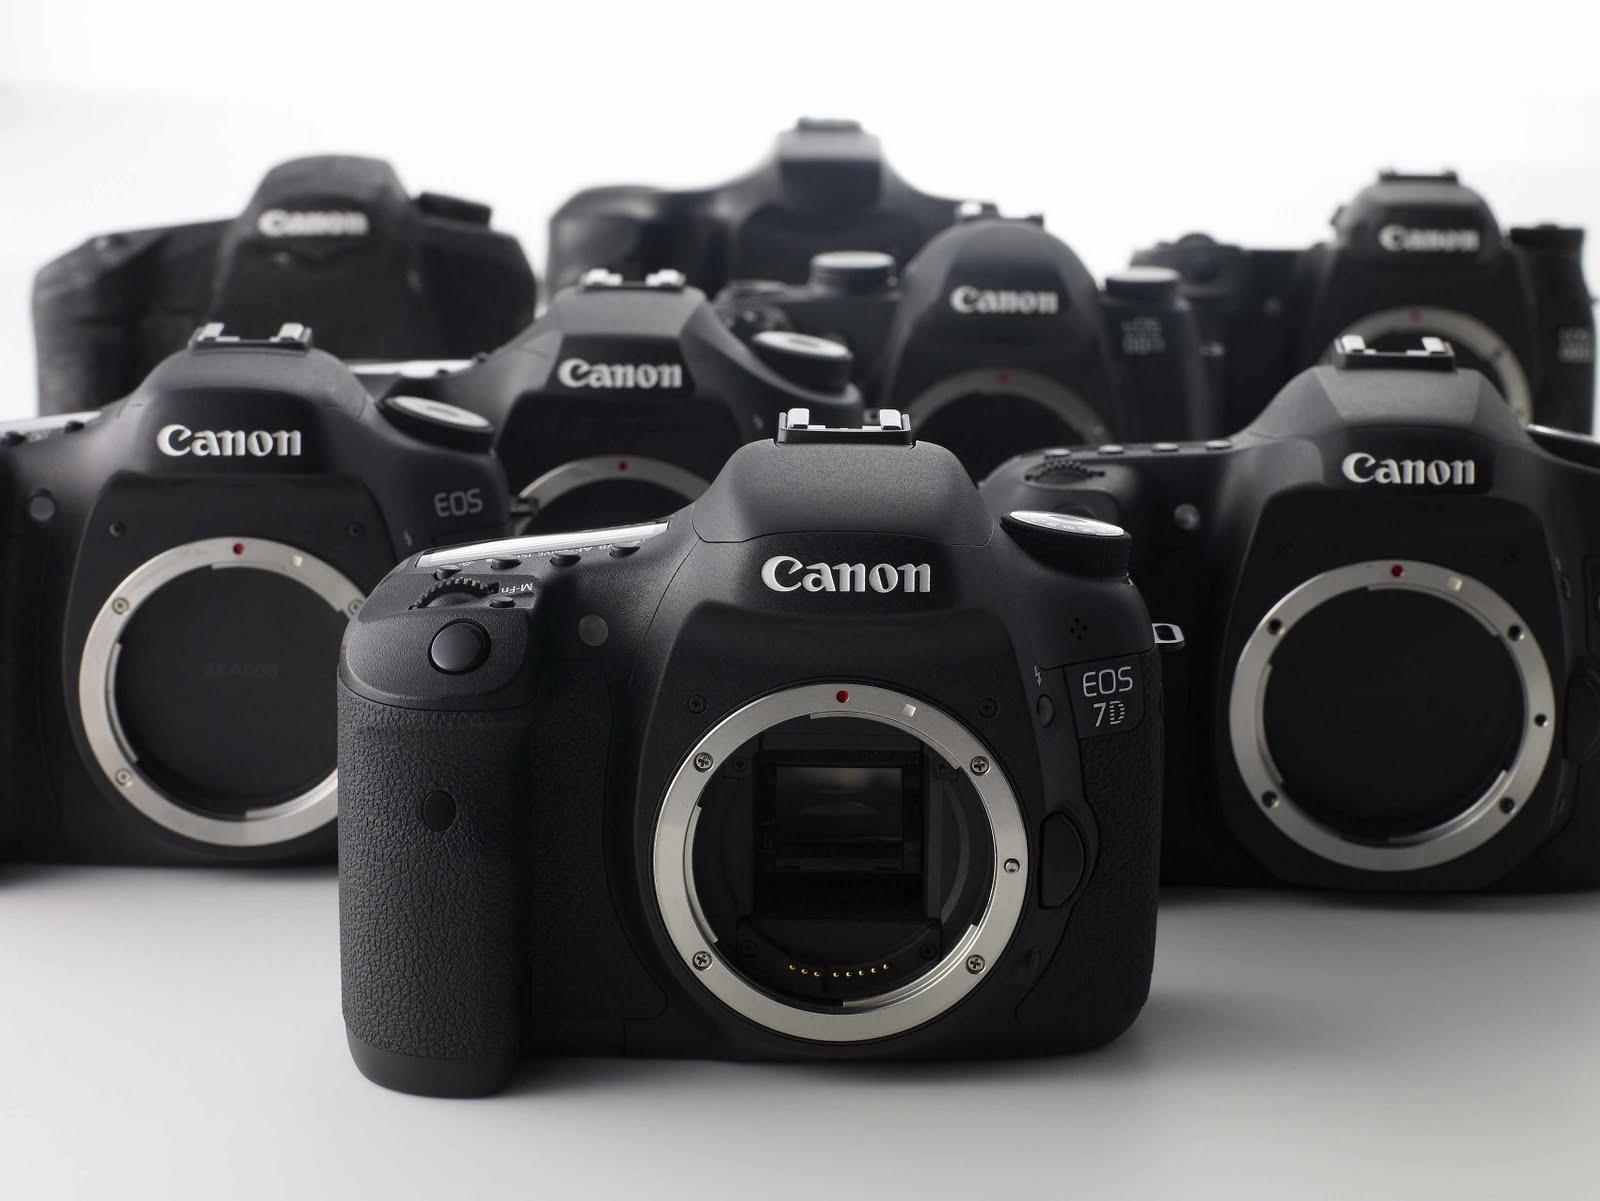 máy ảnh cũ Canon TPHCM